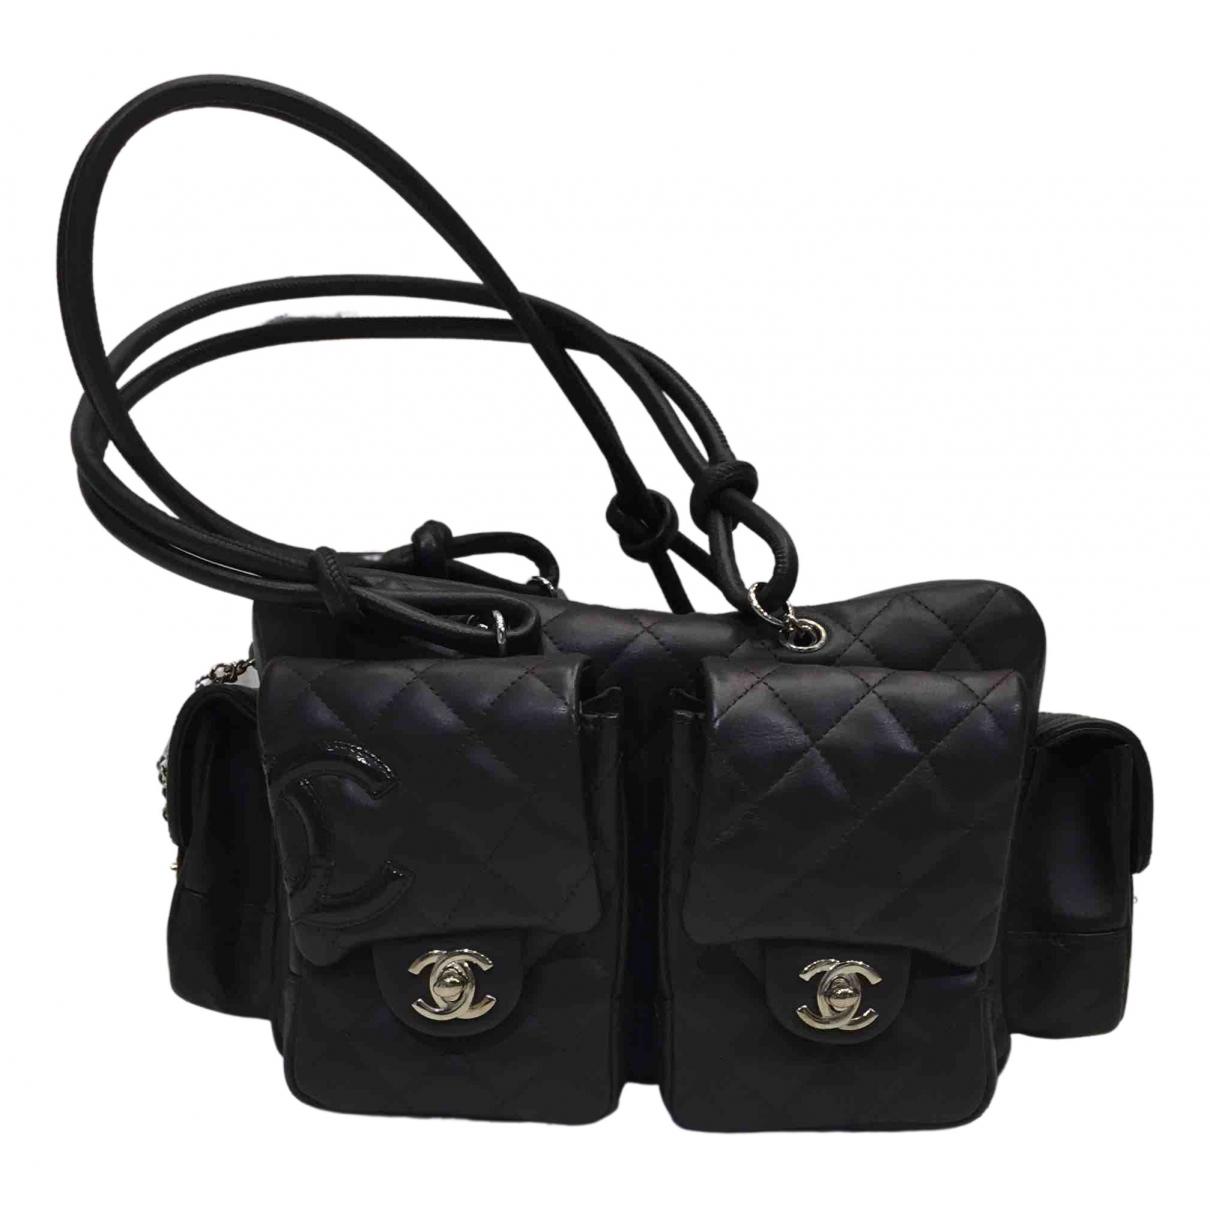 Chanel - Sac a main Cambon pour femme en cuir - marron